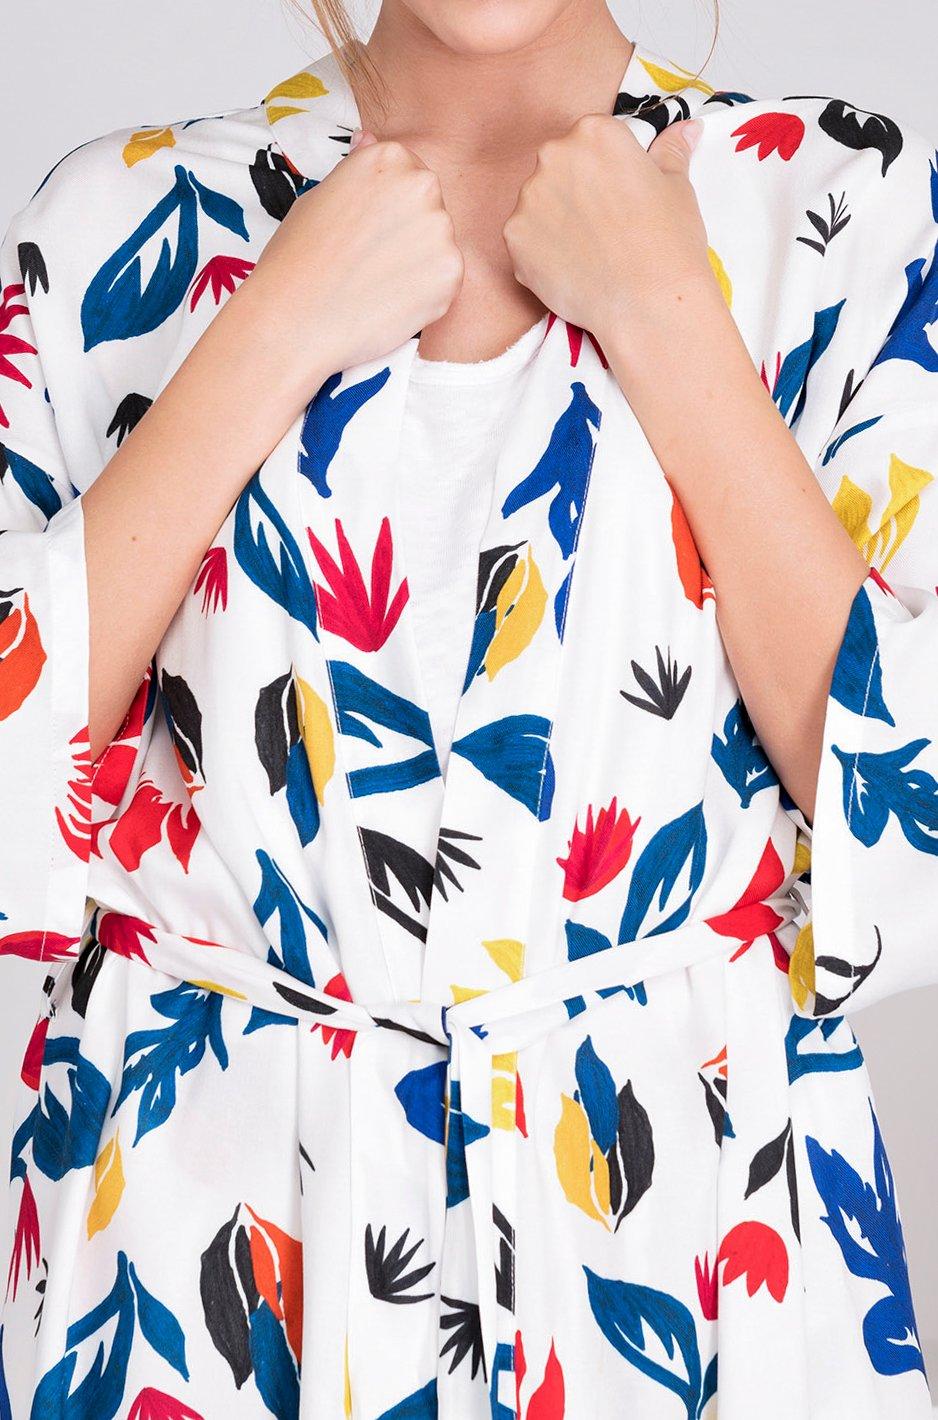 Image of Kimono twill viscose ANGELINE imprimé primaire 139€ -60%